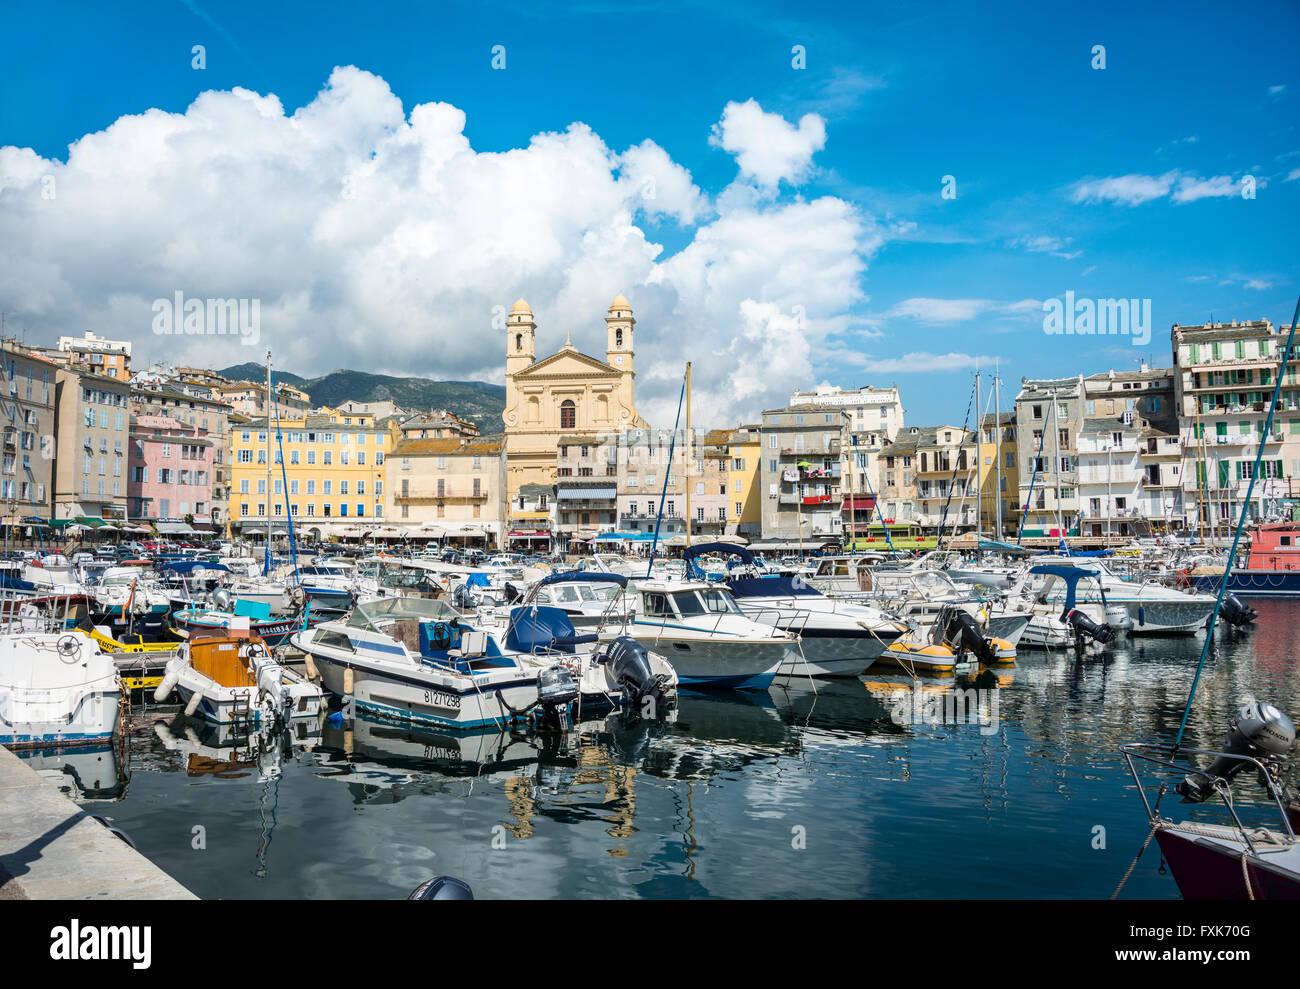 Old port with boats, Vieux port, Port de Plaisance, marina with the church Saint Jean Baptiste, Bastia, Haute-Corse, - Stock Image